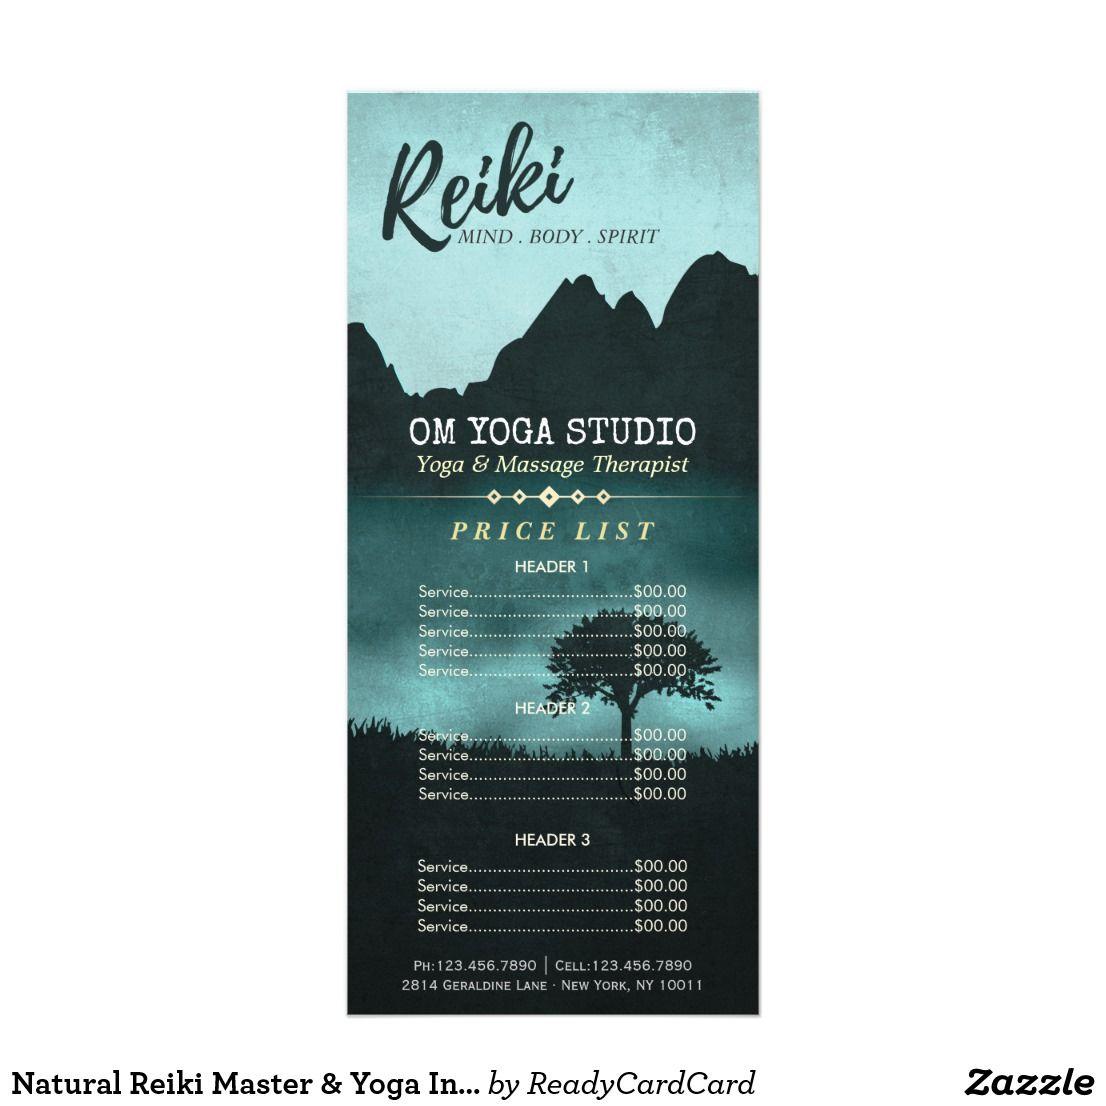 Natural Reiki Master & Yoga Instructor Price List Rack Card | Reiki ...